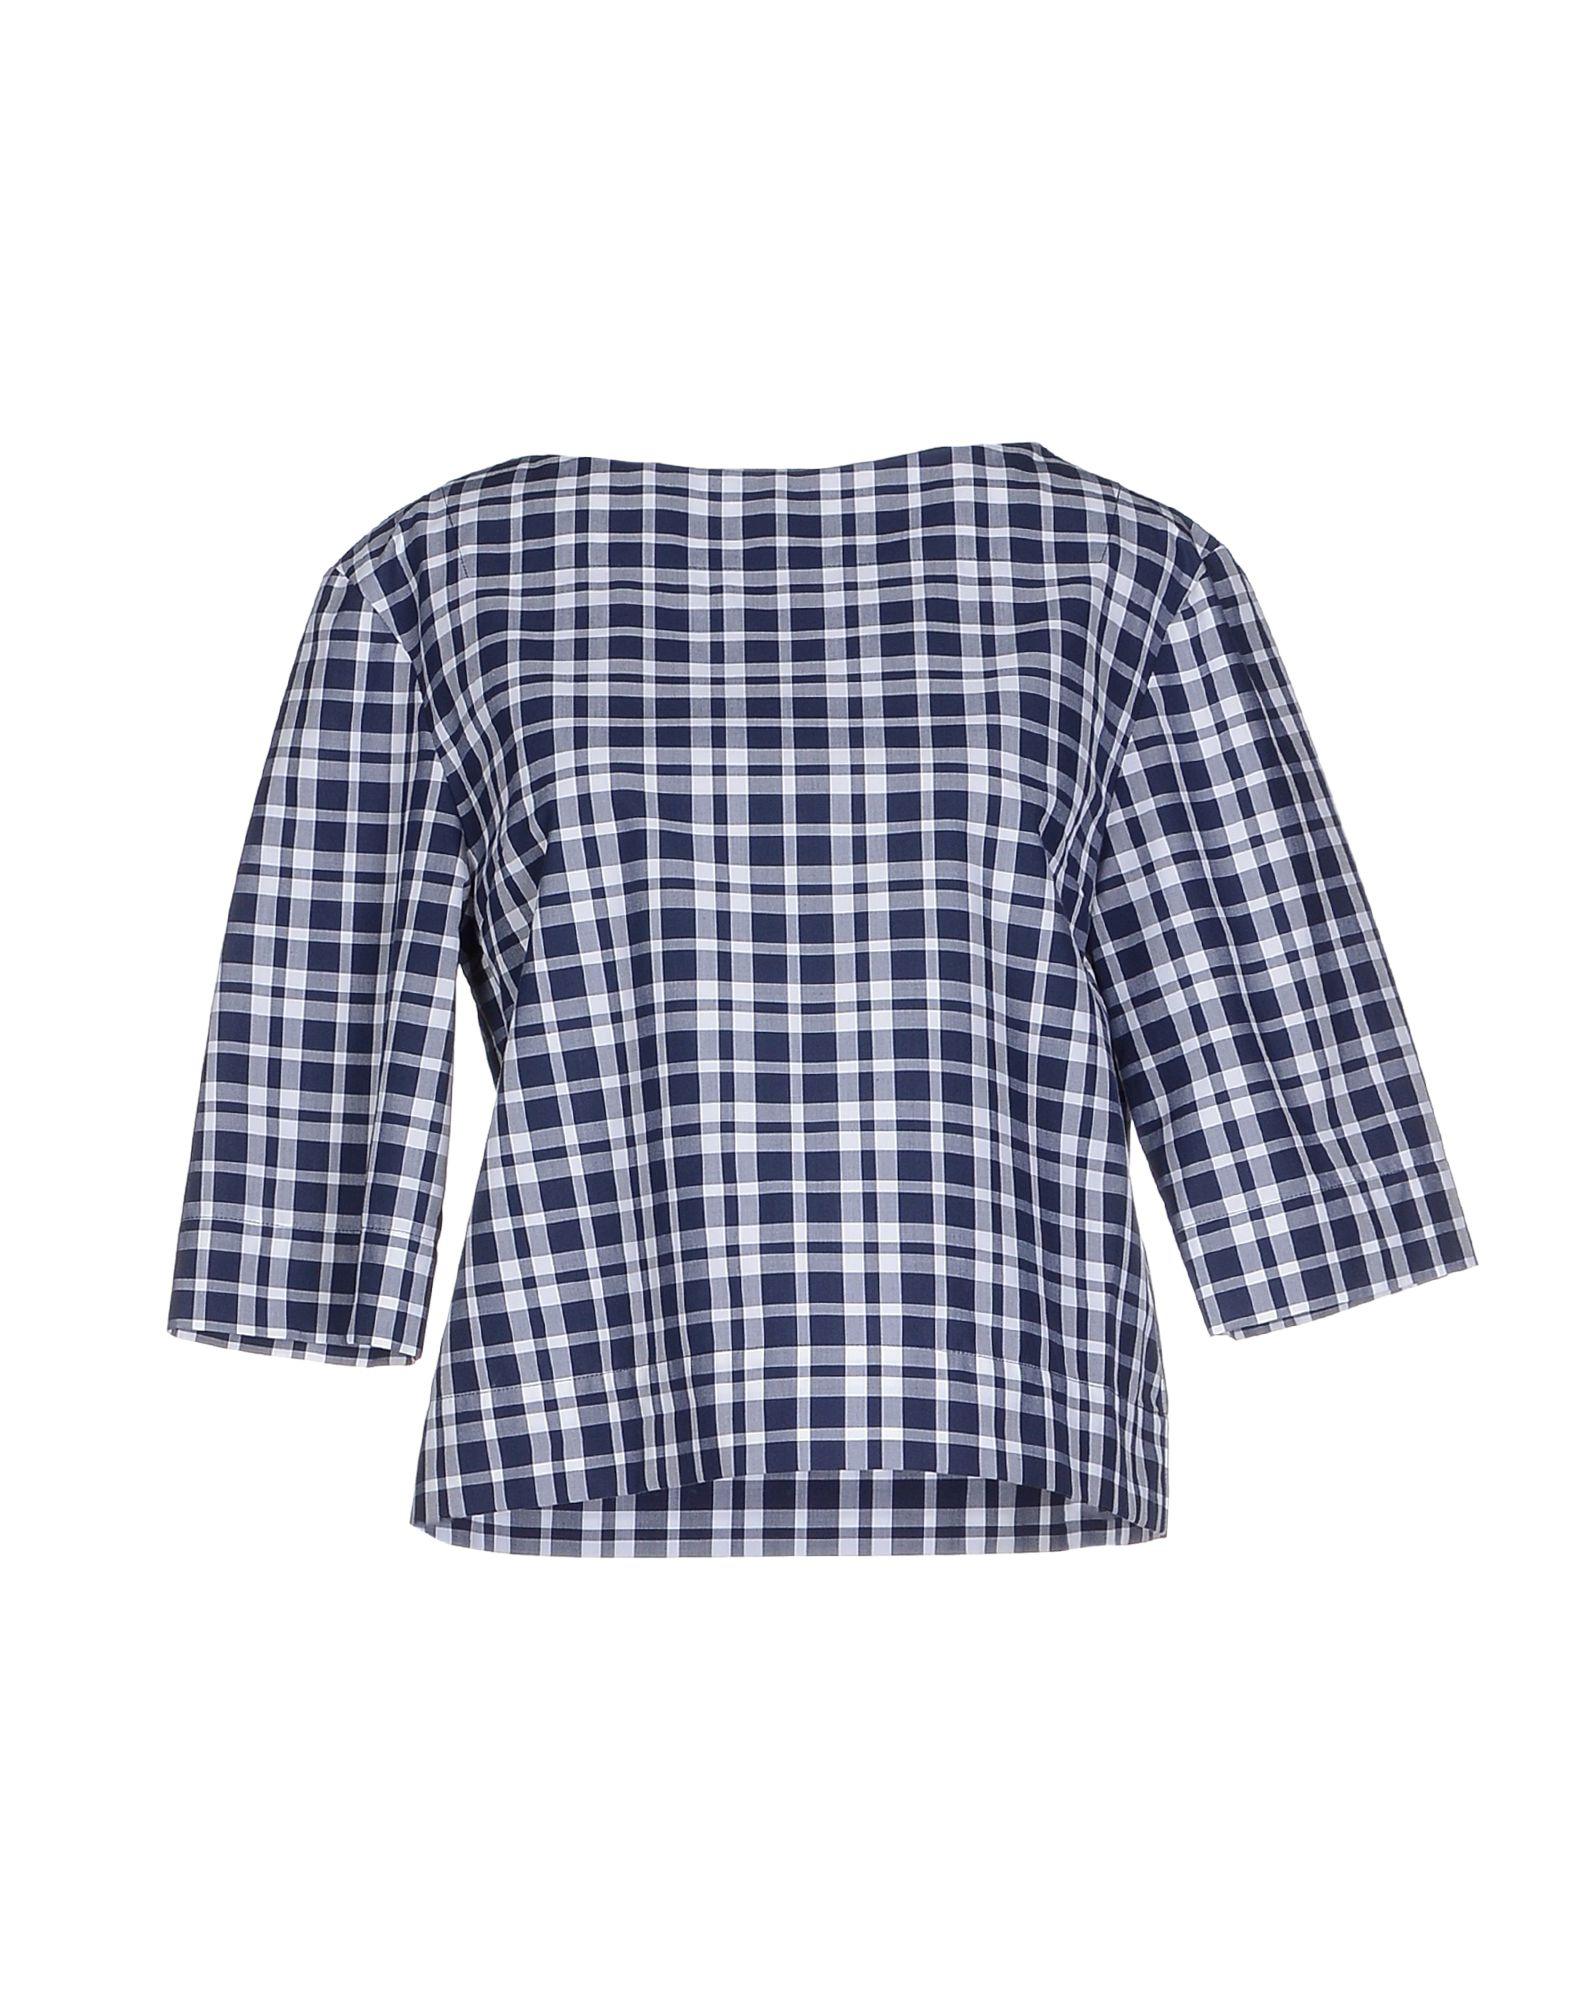 michael kors female michael kors blouses